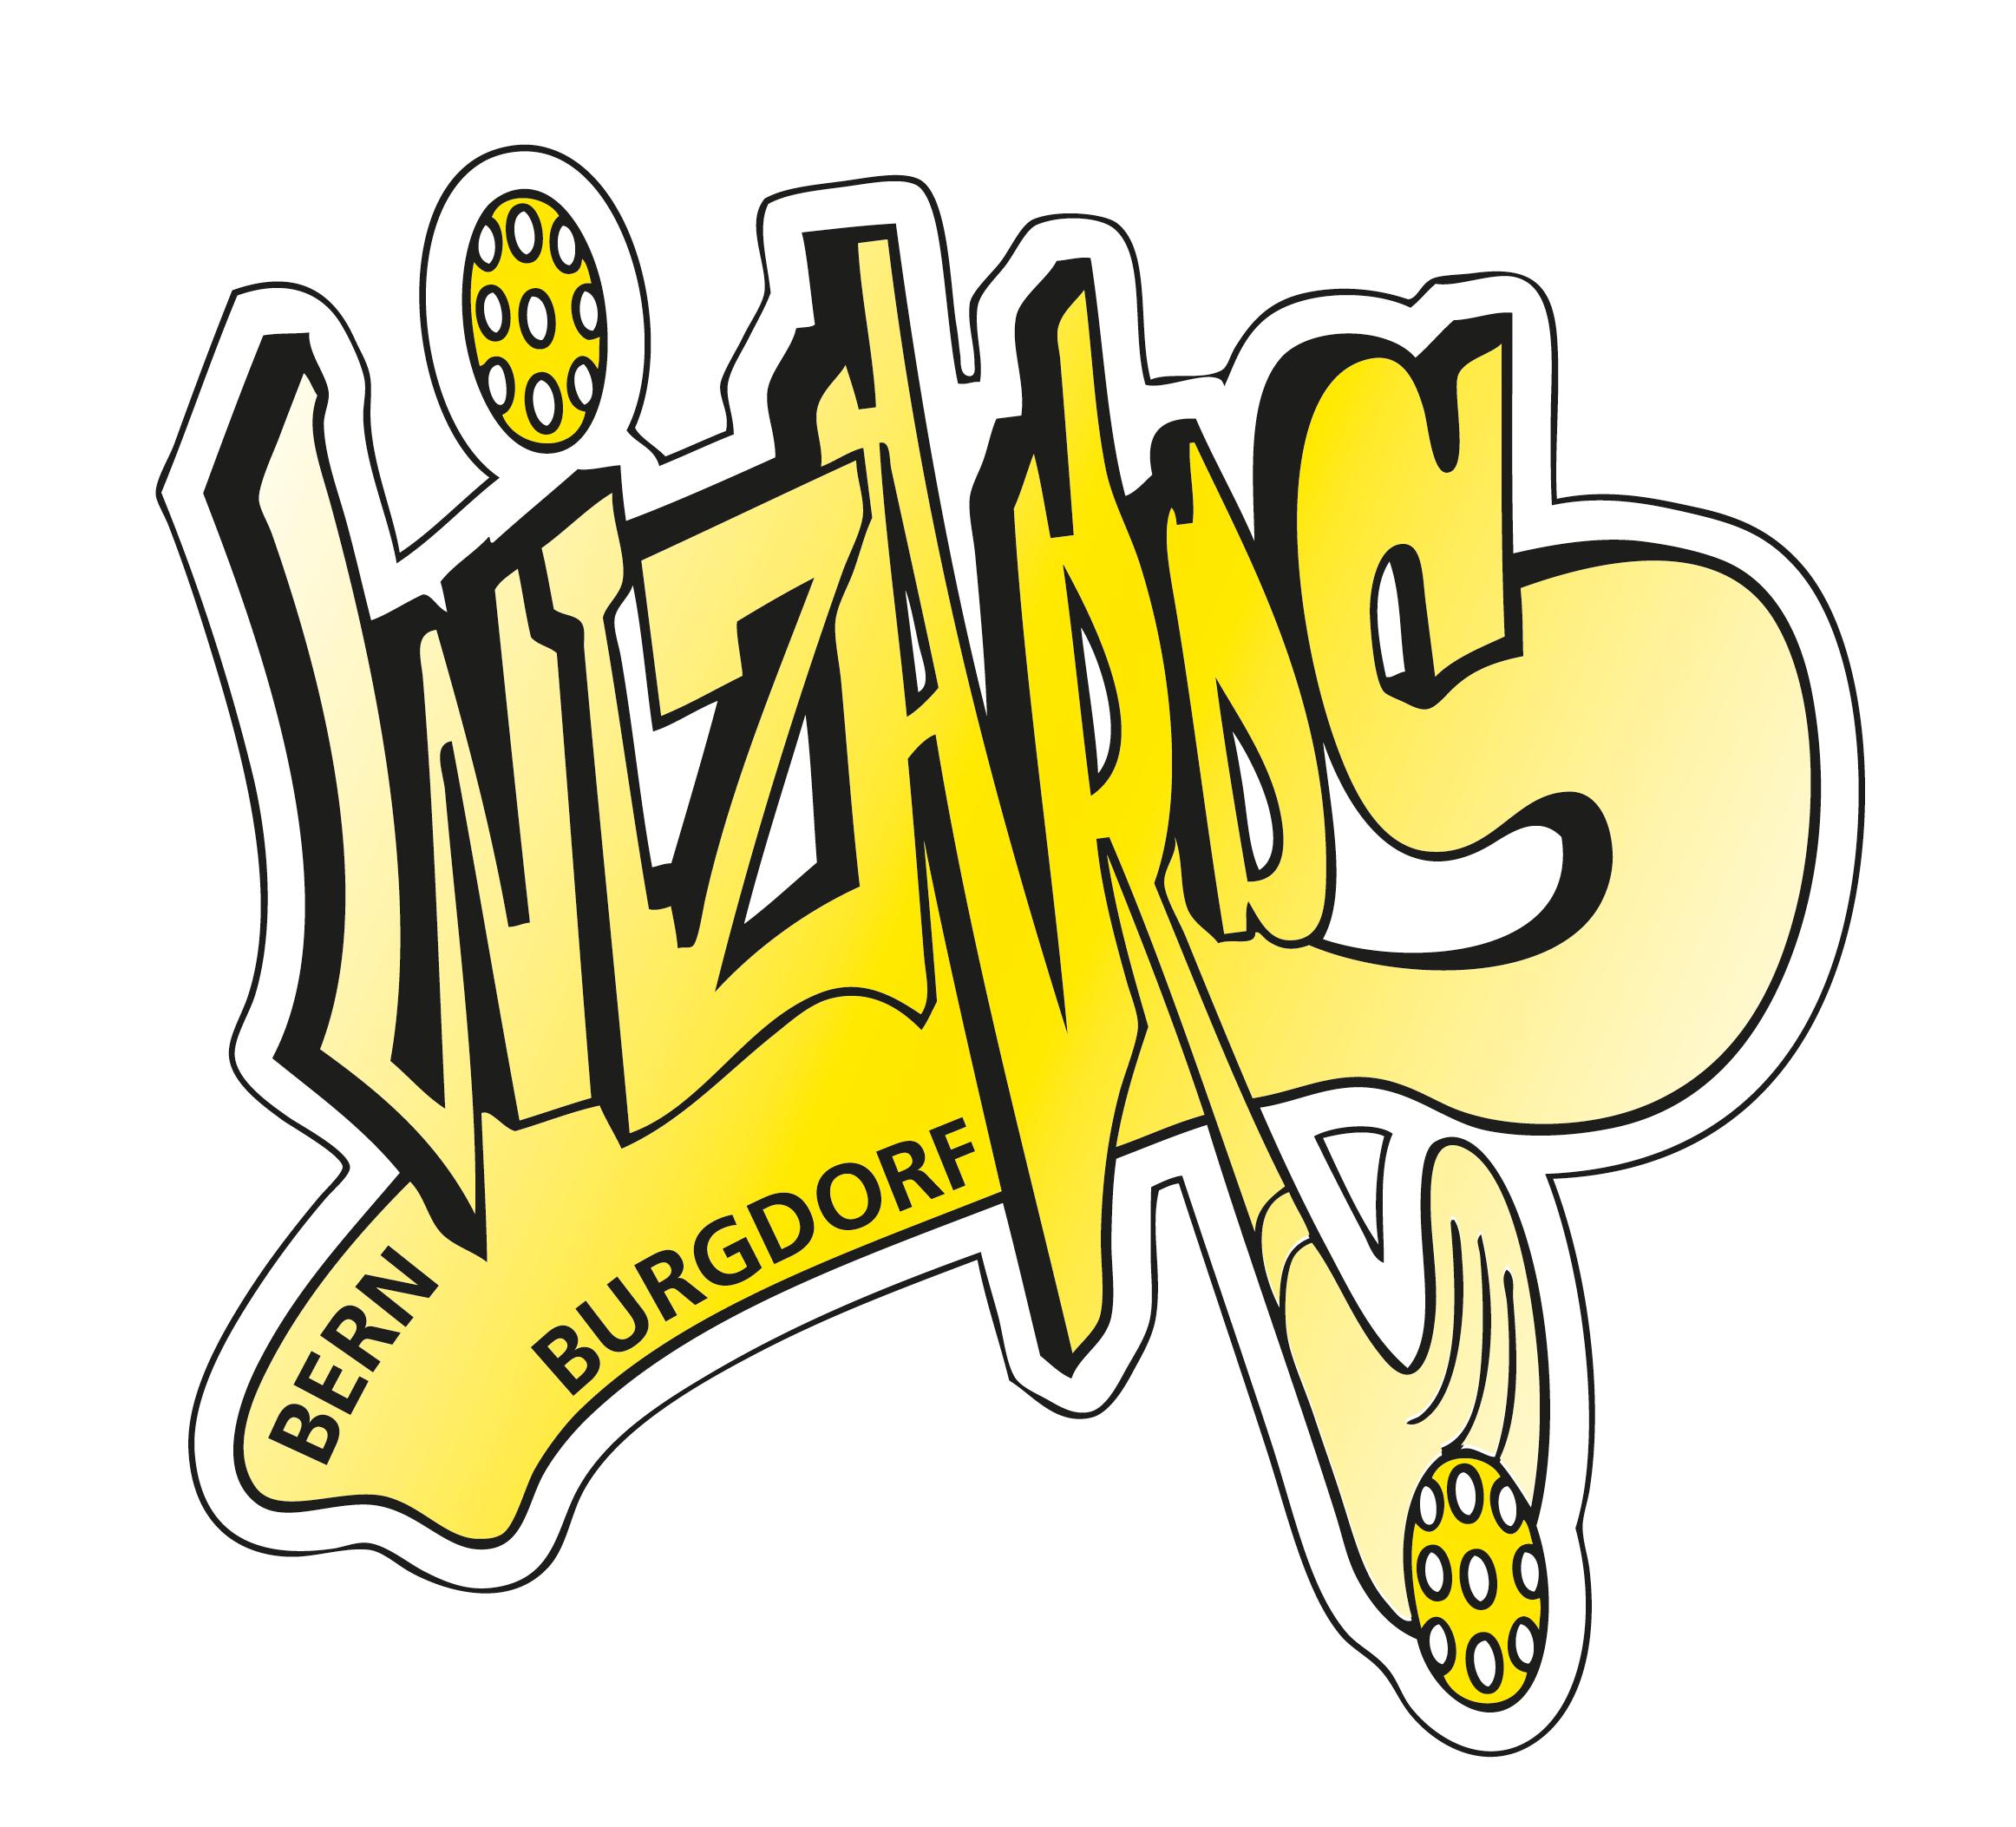 Logo_Bern_Burgdorf_Wizard.psd